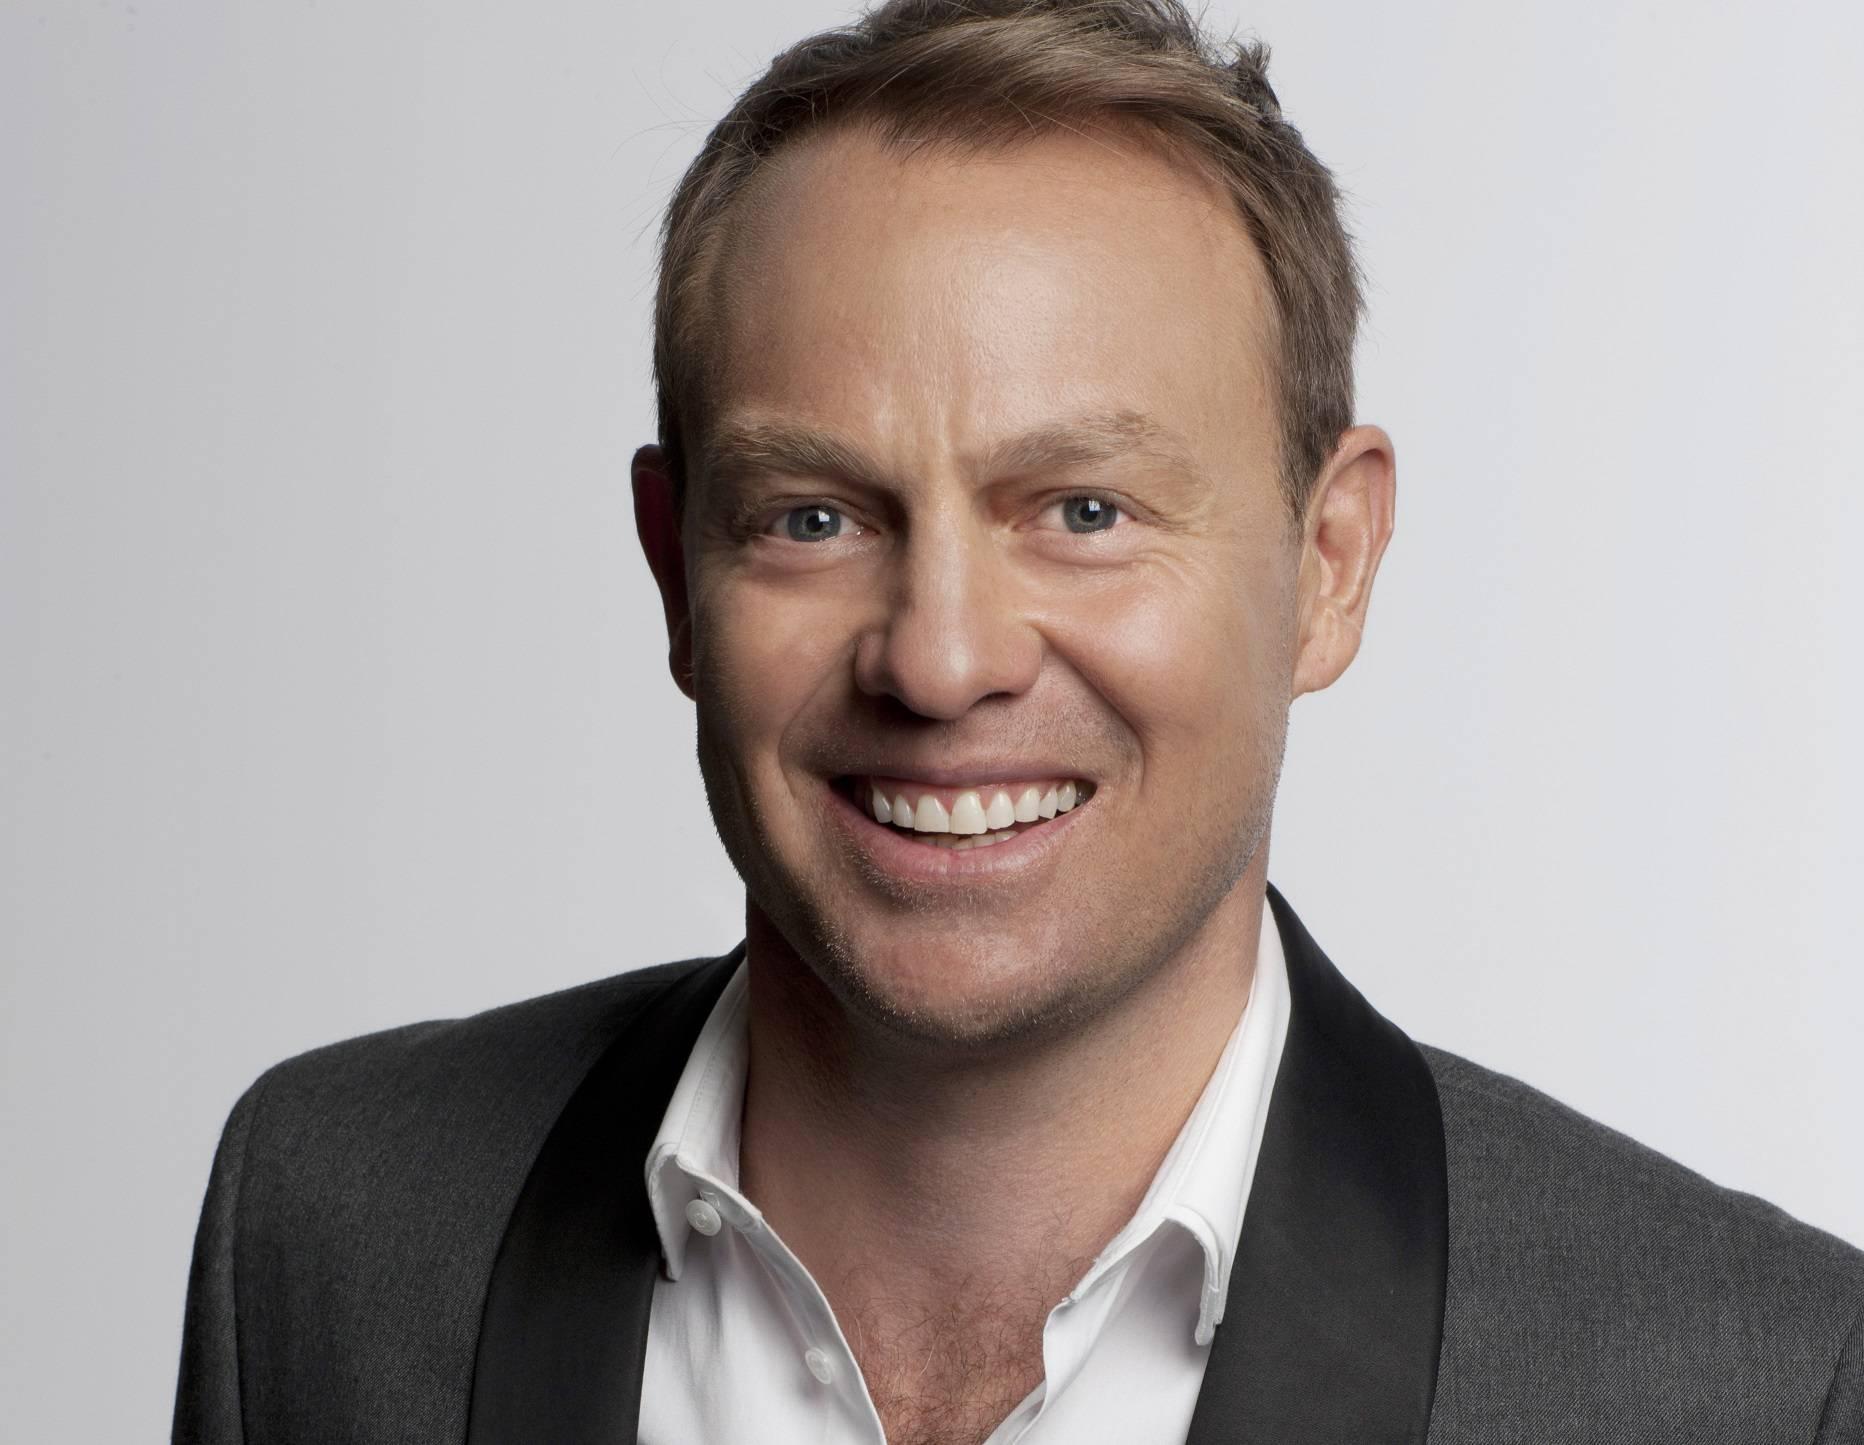 Jason Donovan got his big break on Australian TV.